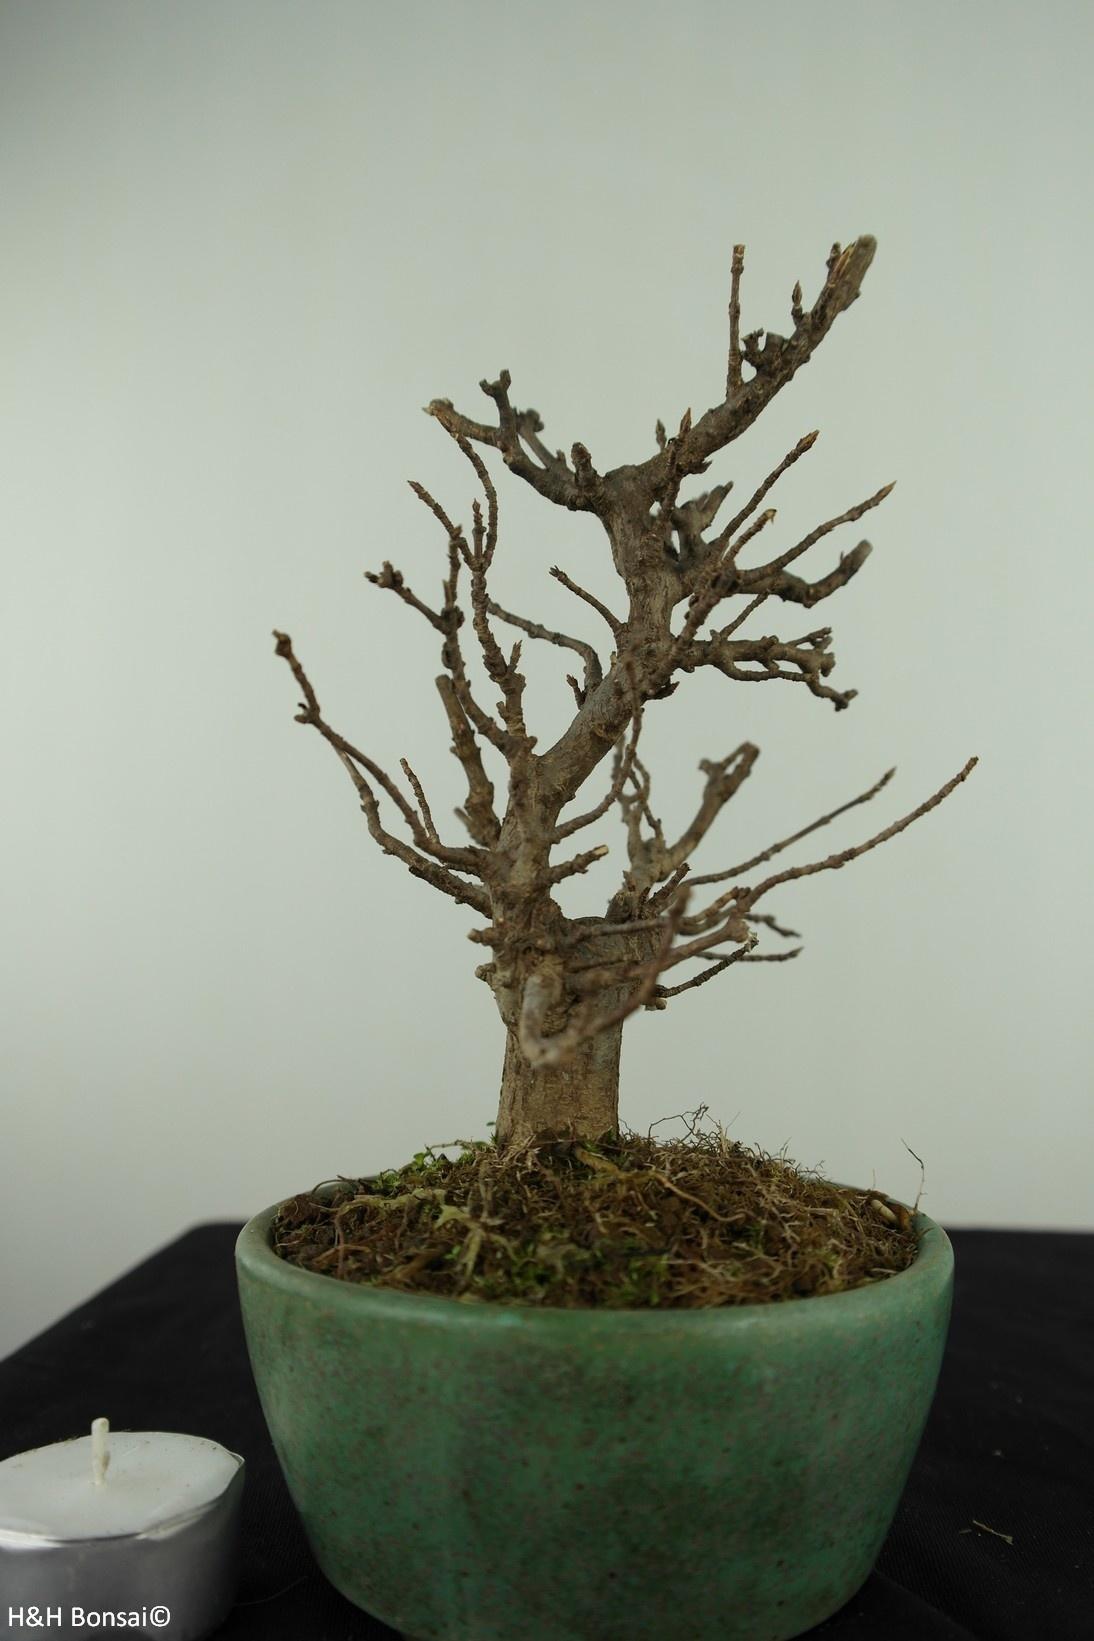 Bonsai Shohin Trident maple, Acer buergerianum, no. 7516